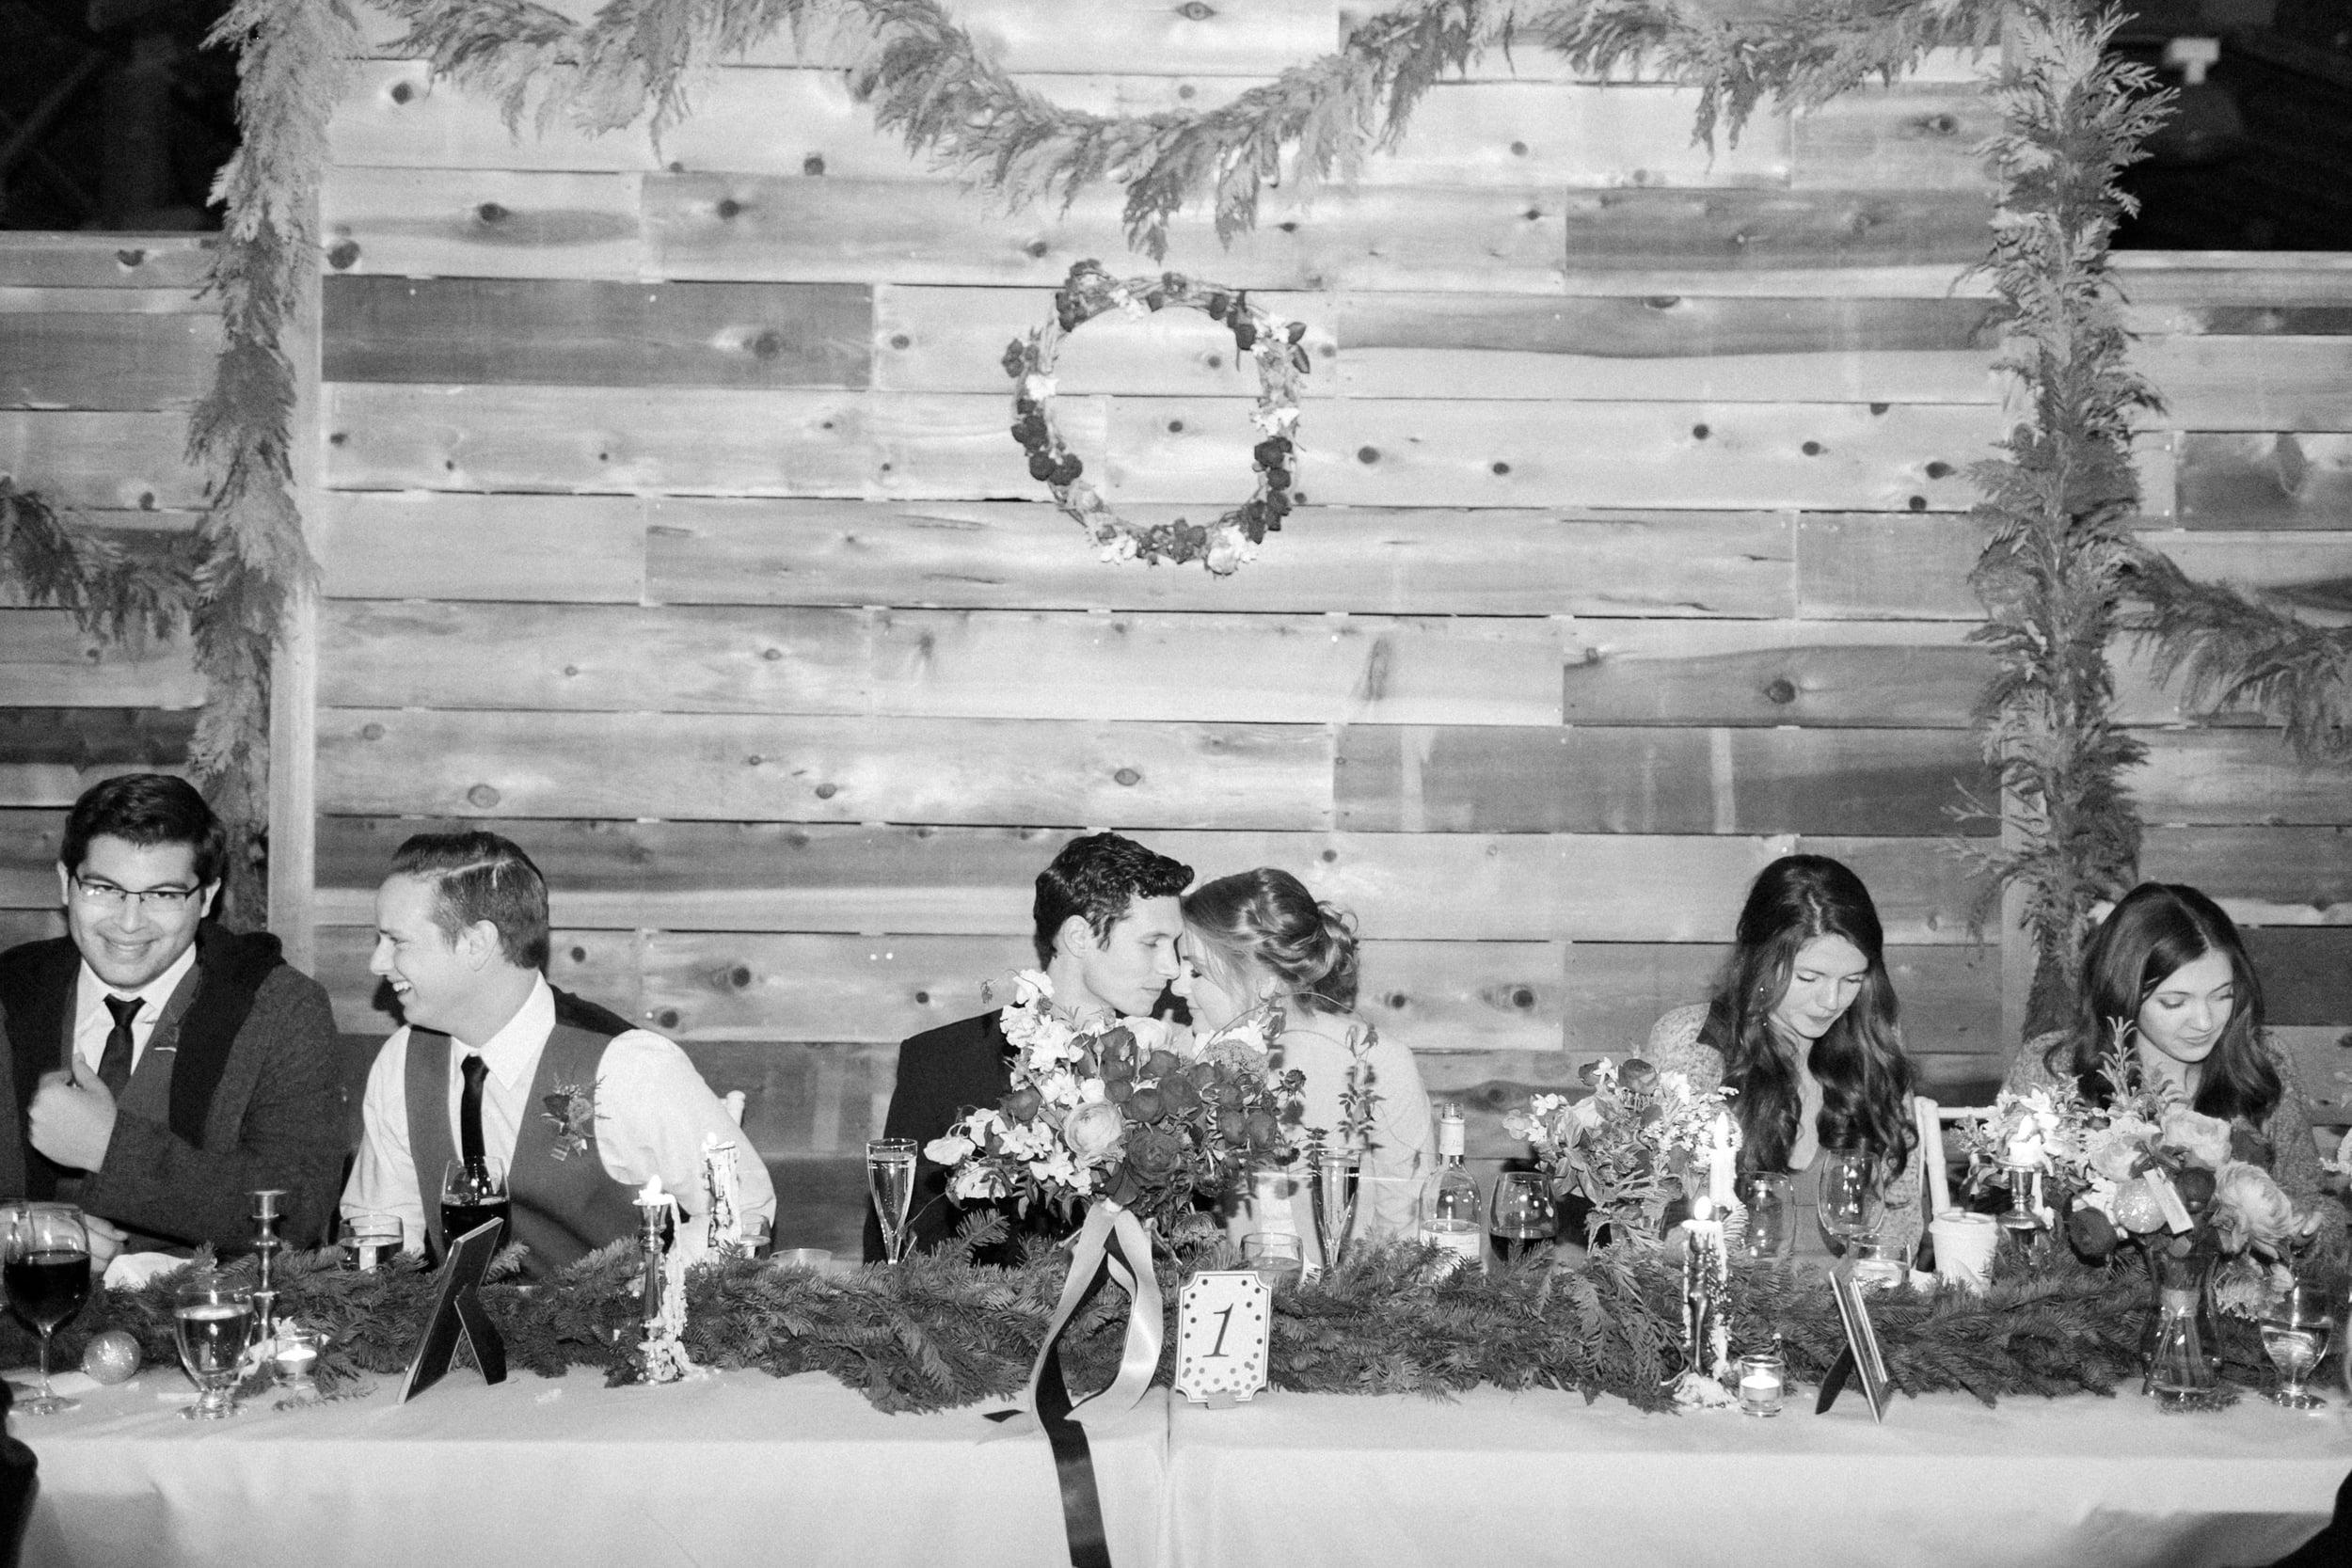 Natalie_Schutt_Photography_Winter_Wedding_San_Luis_Obispo-215.jpg